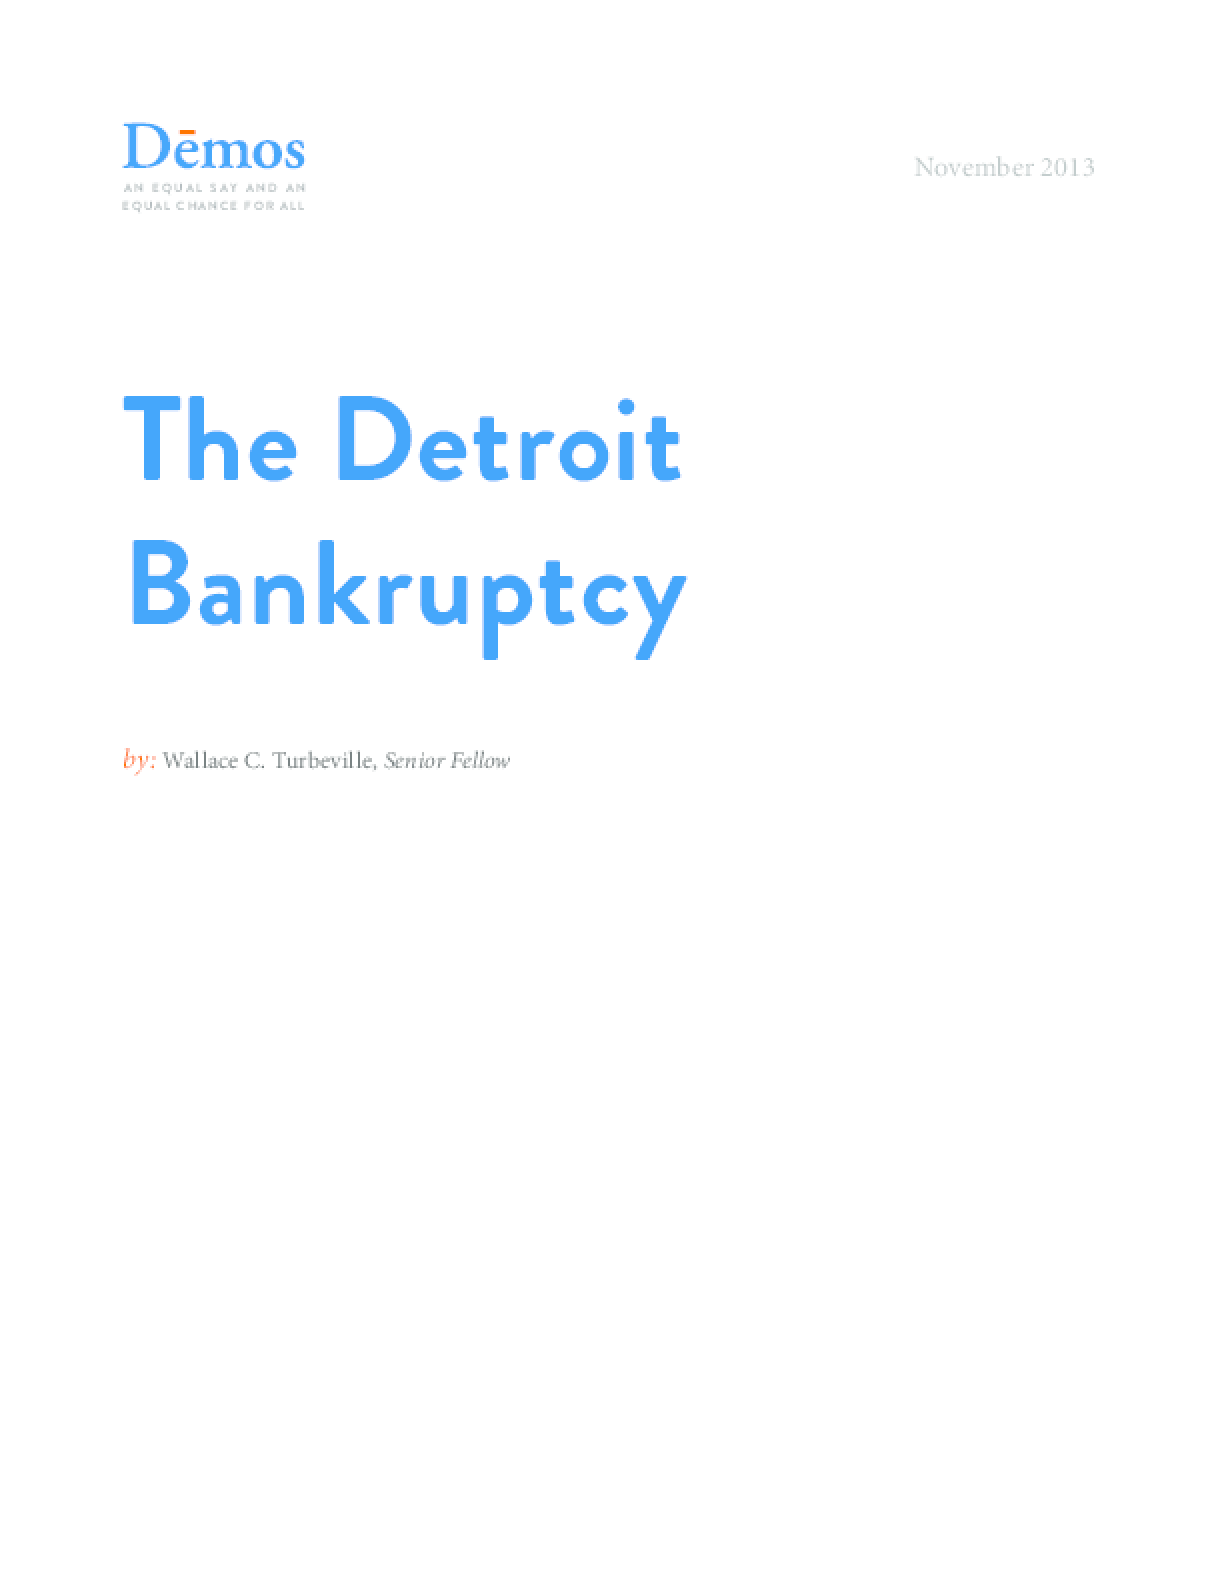 The Detroit Bankruptcy